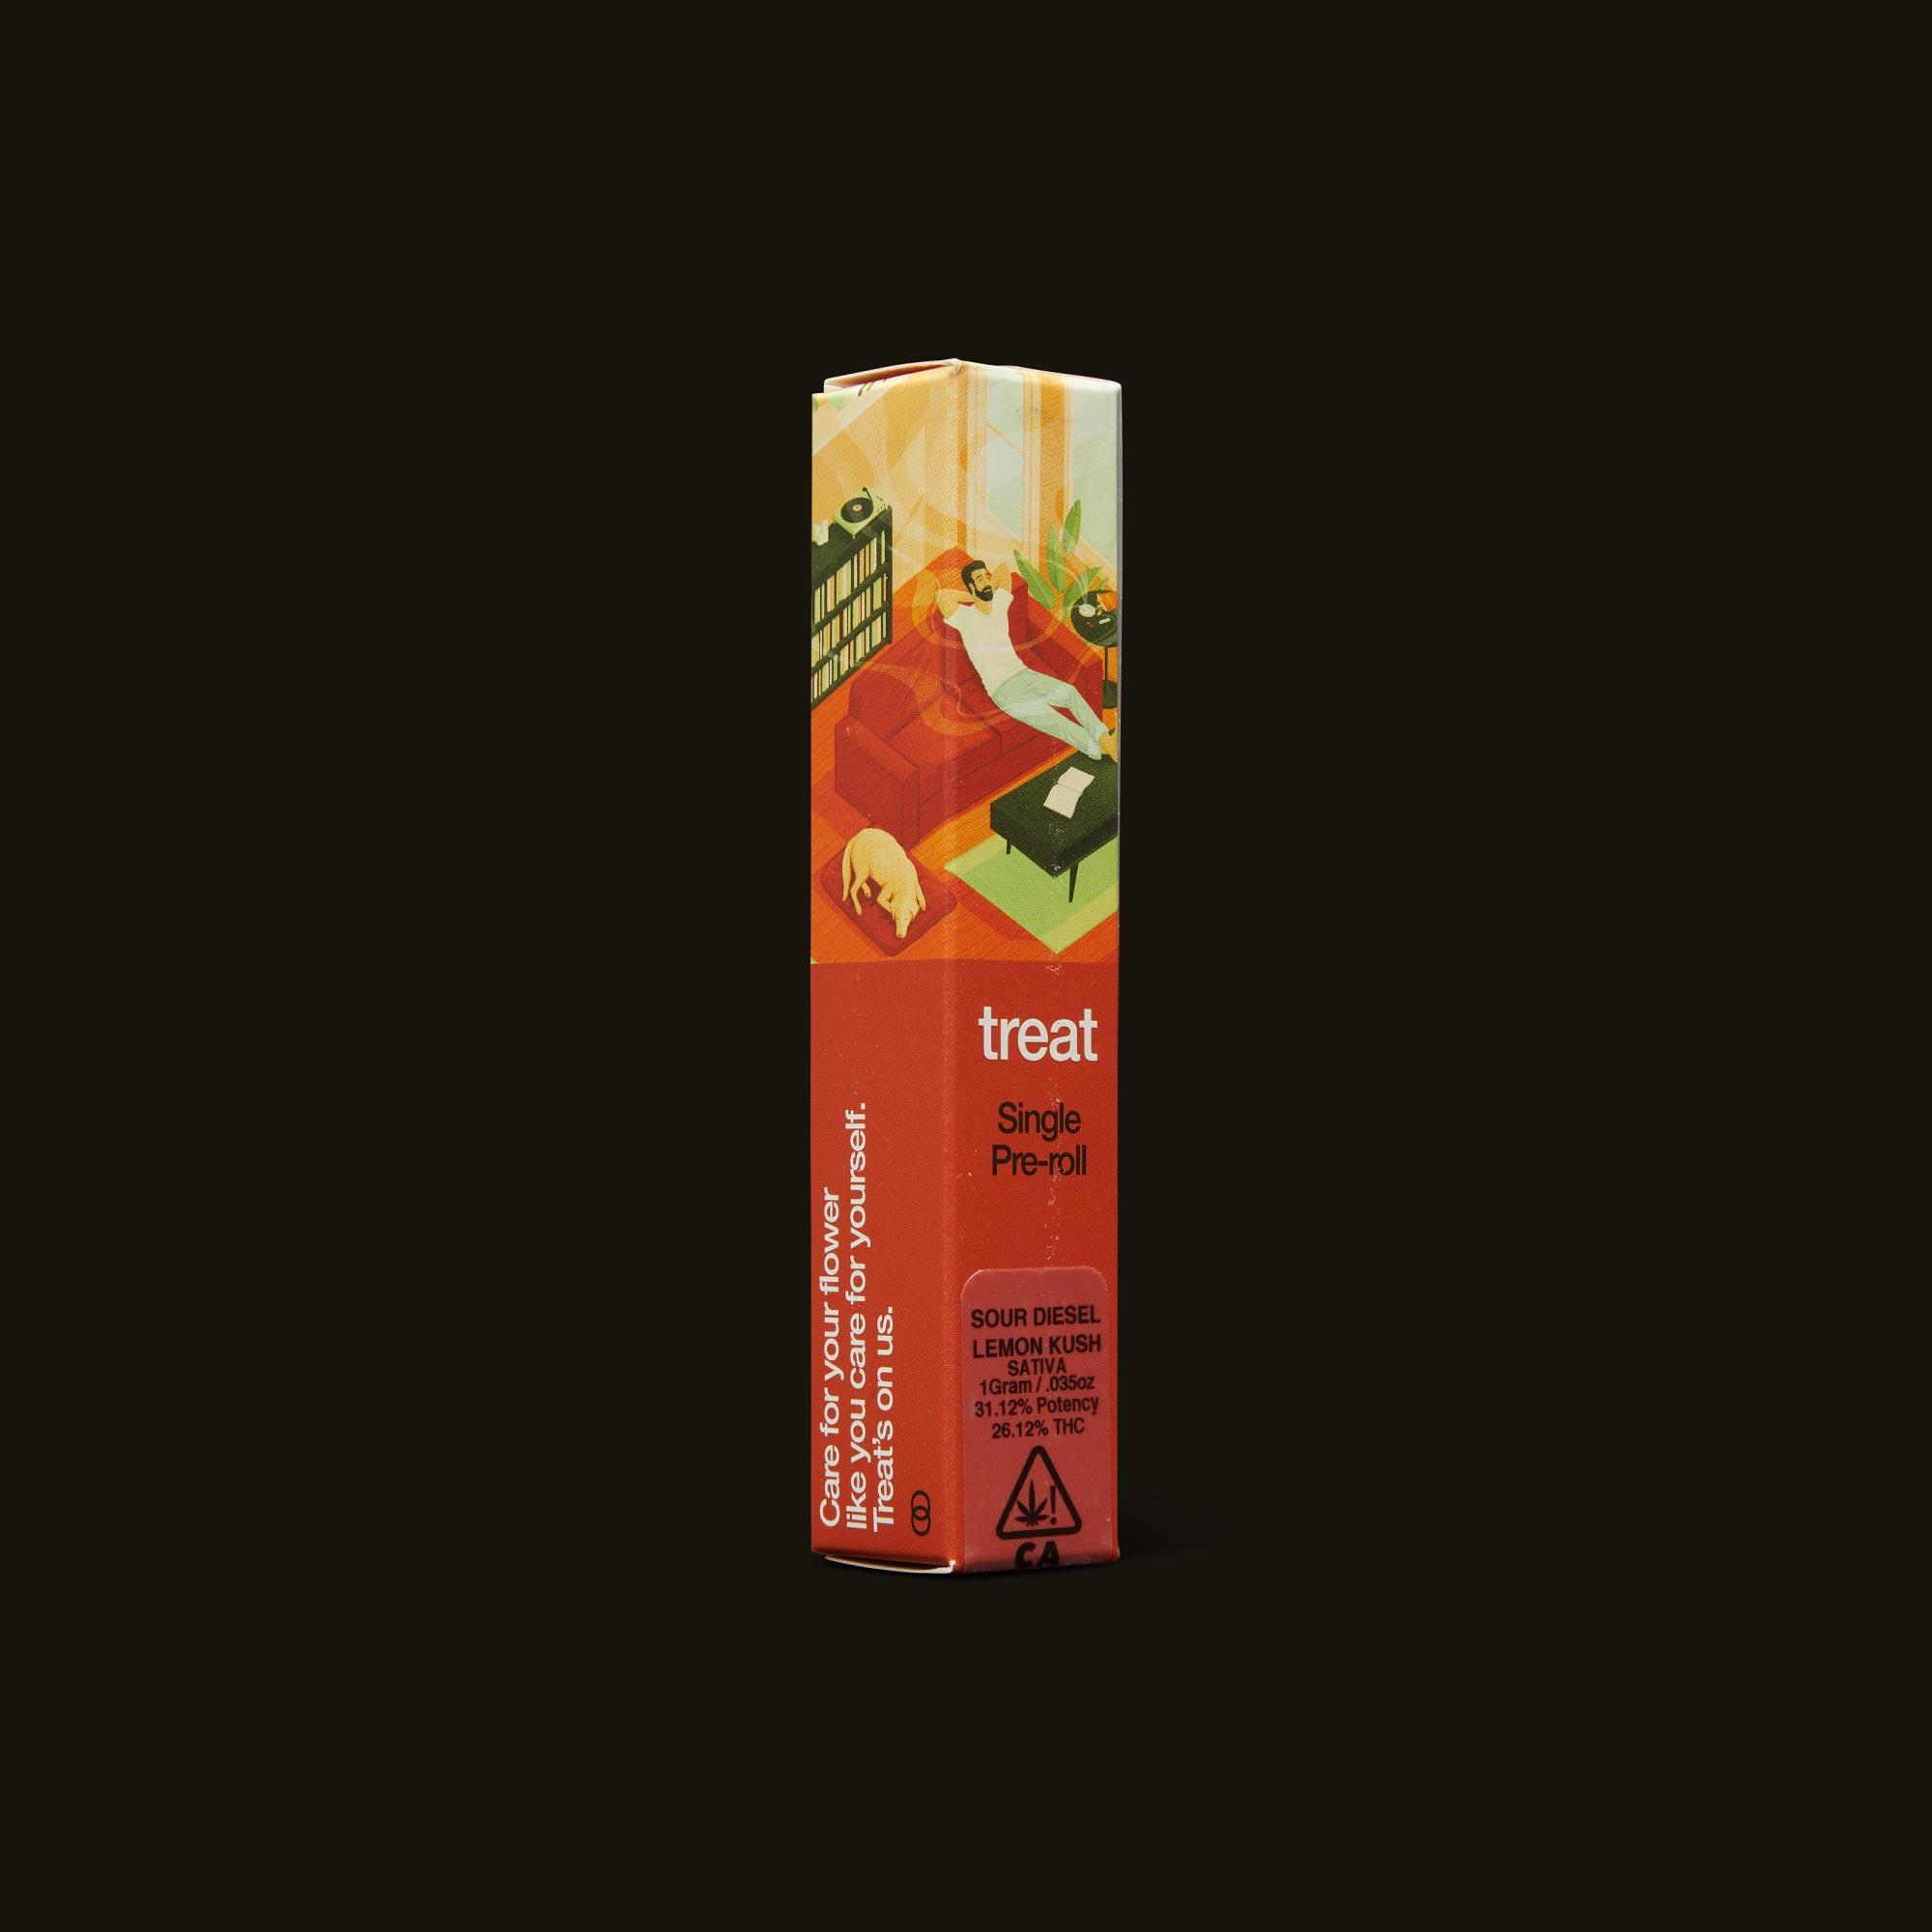 treat Sour Diesel Lemon Kush Pre-Roll Side Packaging